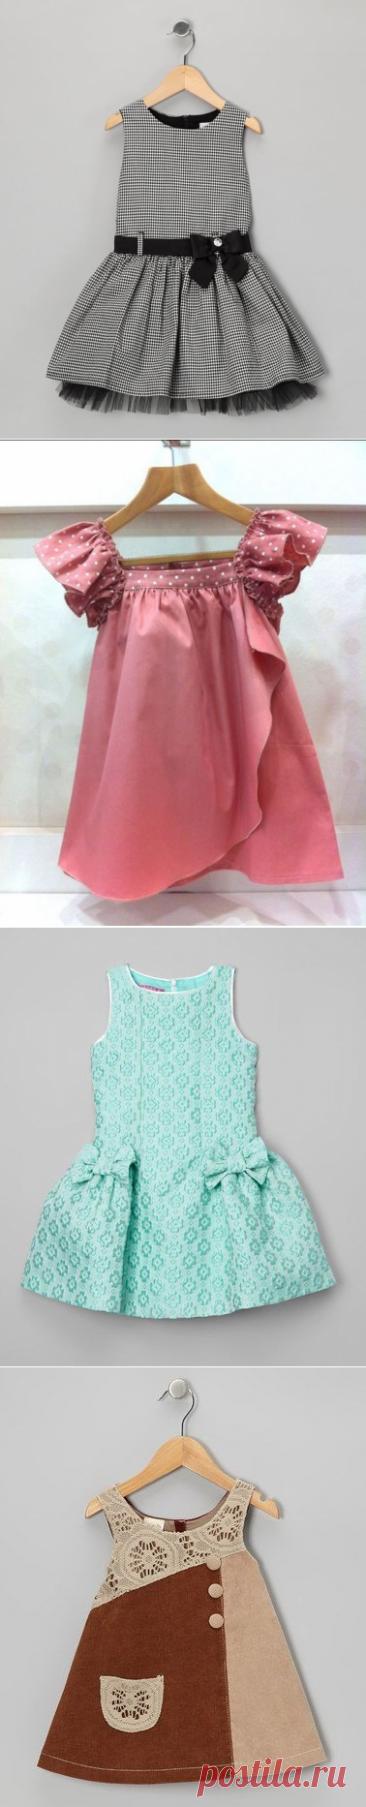 dikulya67: Маленьким модницам. | dikulya67 | Bloglovin '